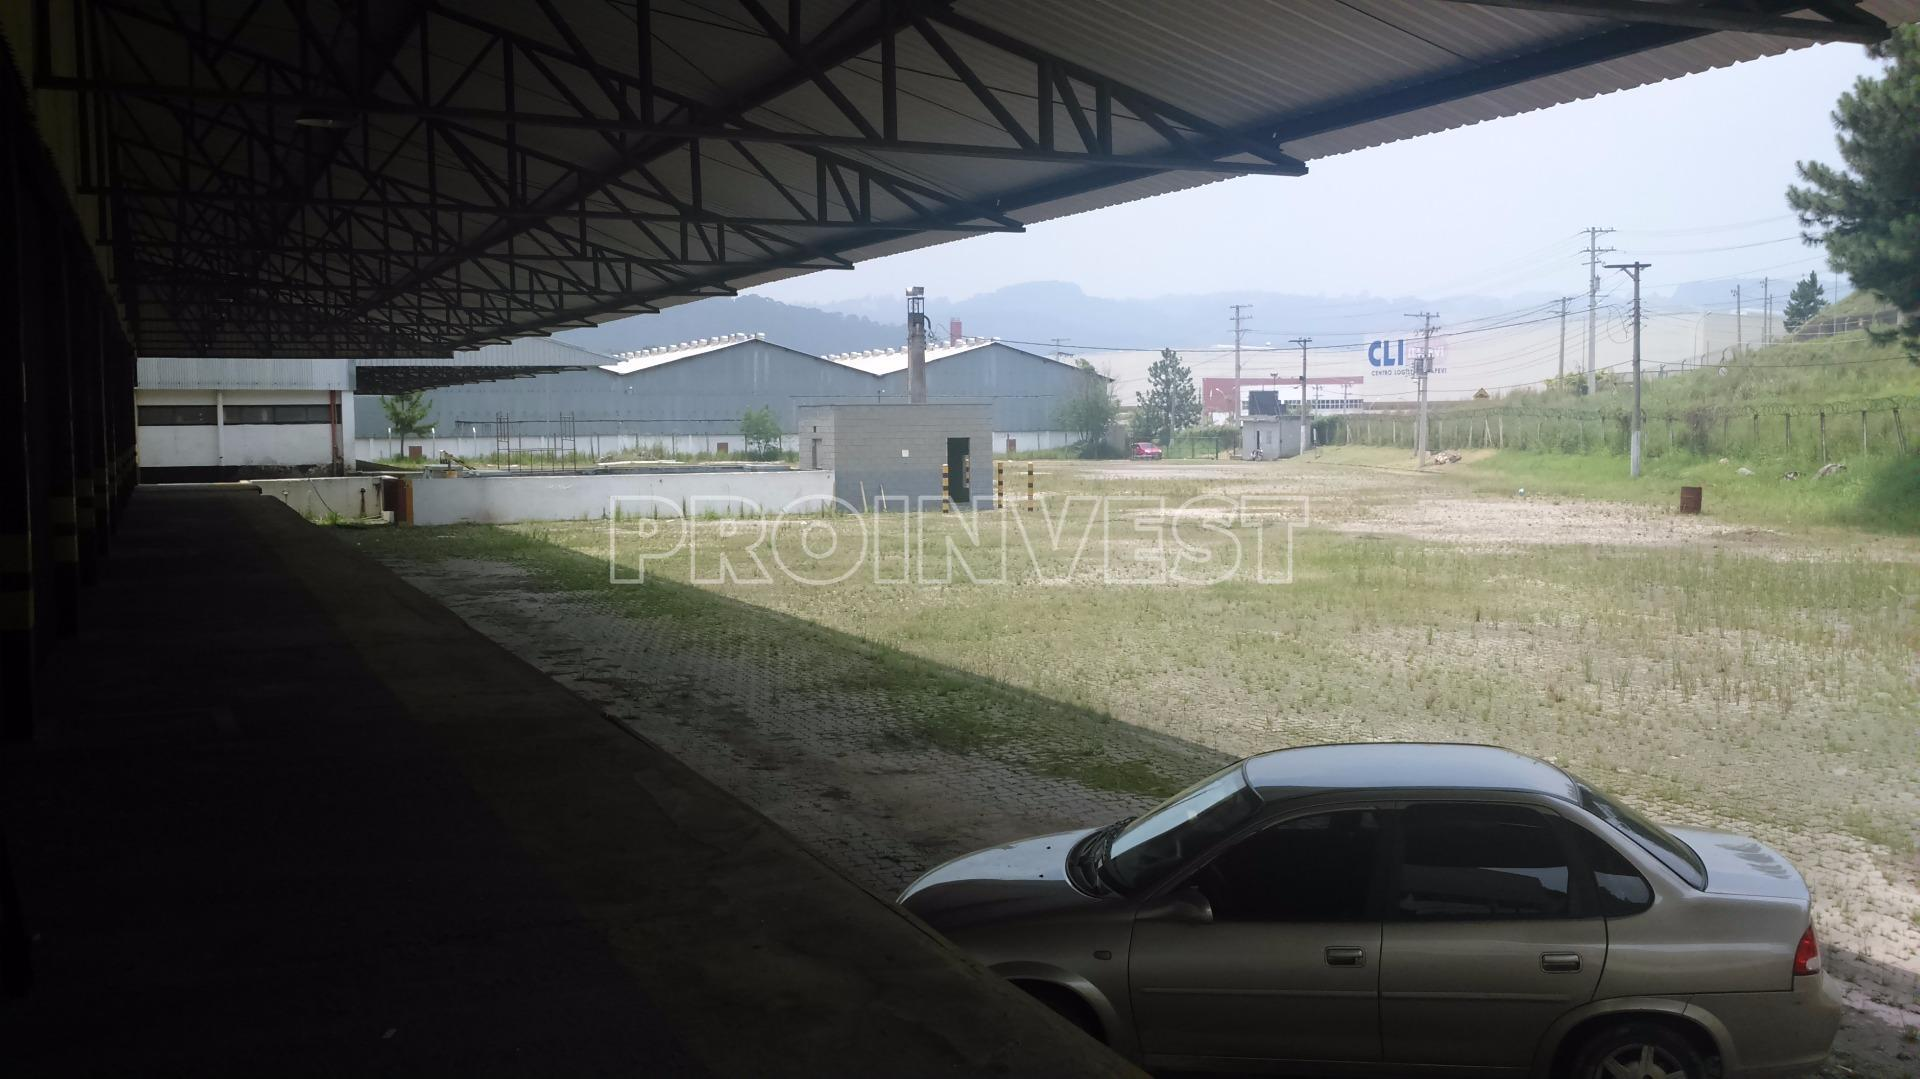 Galpão à venda em Itaqui, Itapevi - SP